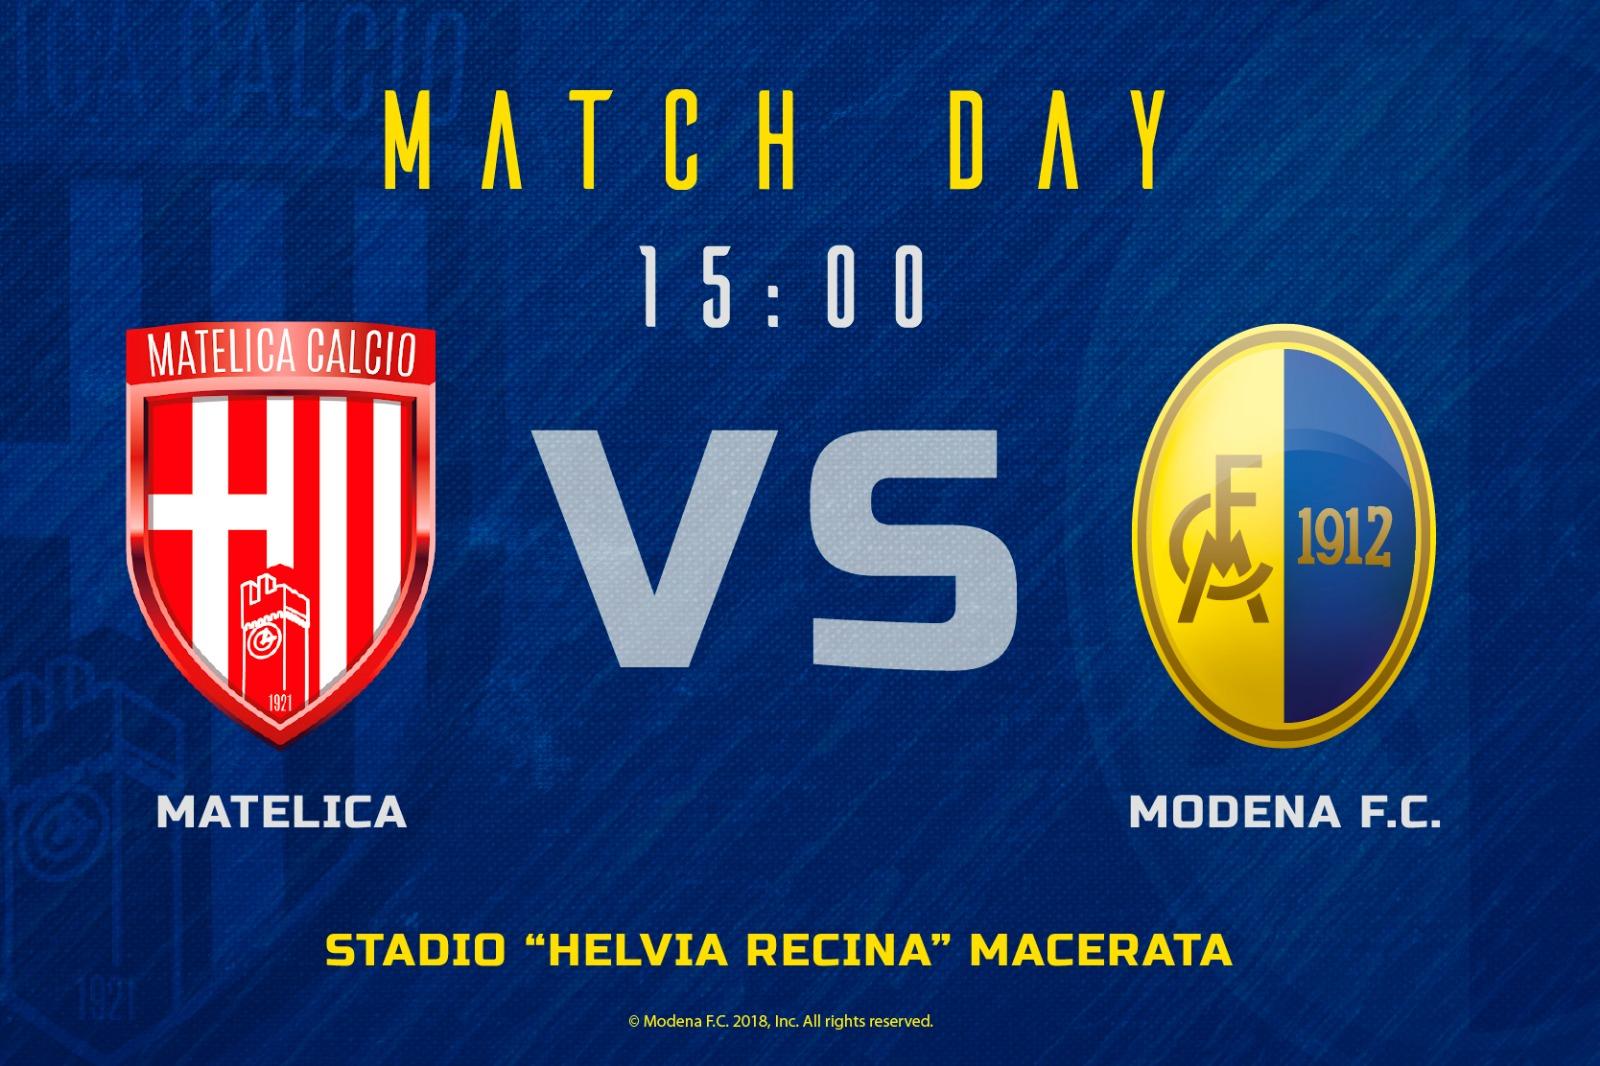 Matelica vs Modena Match